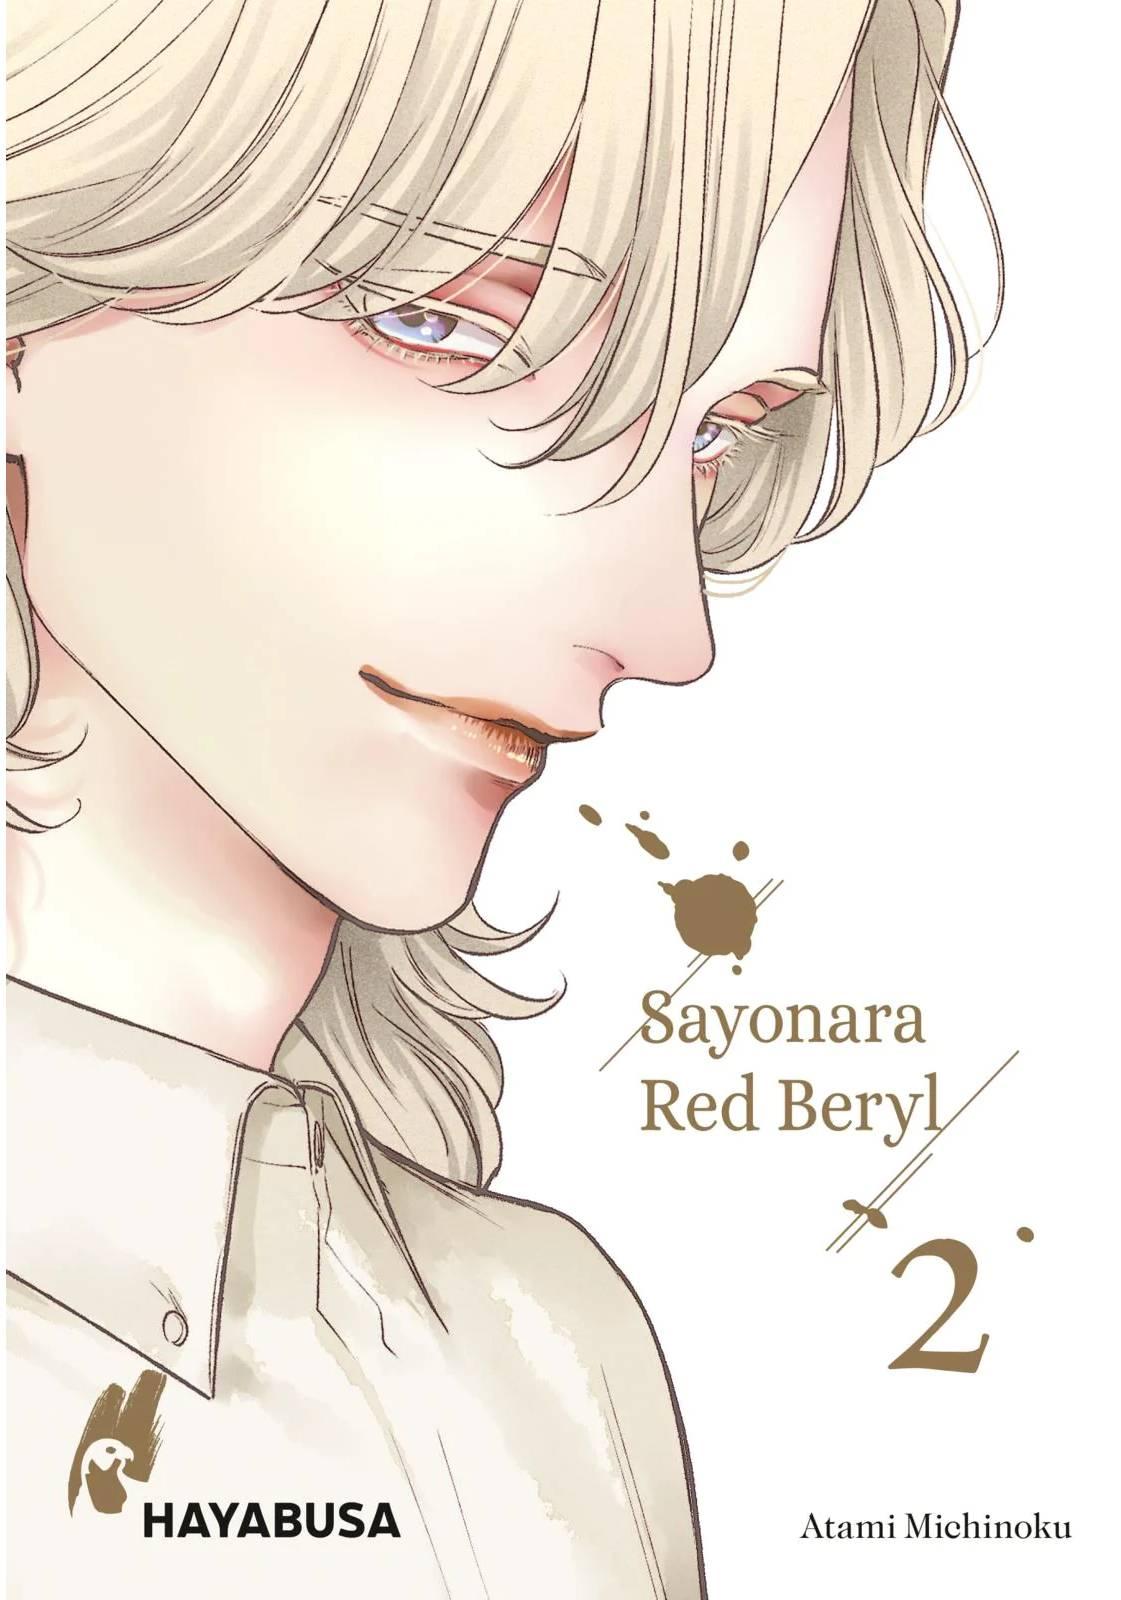 Atami Michinoku | Sayonara Red Beryl 2